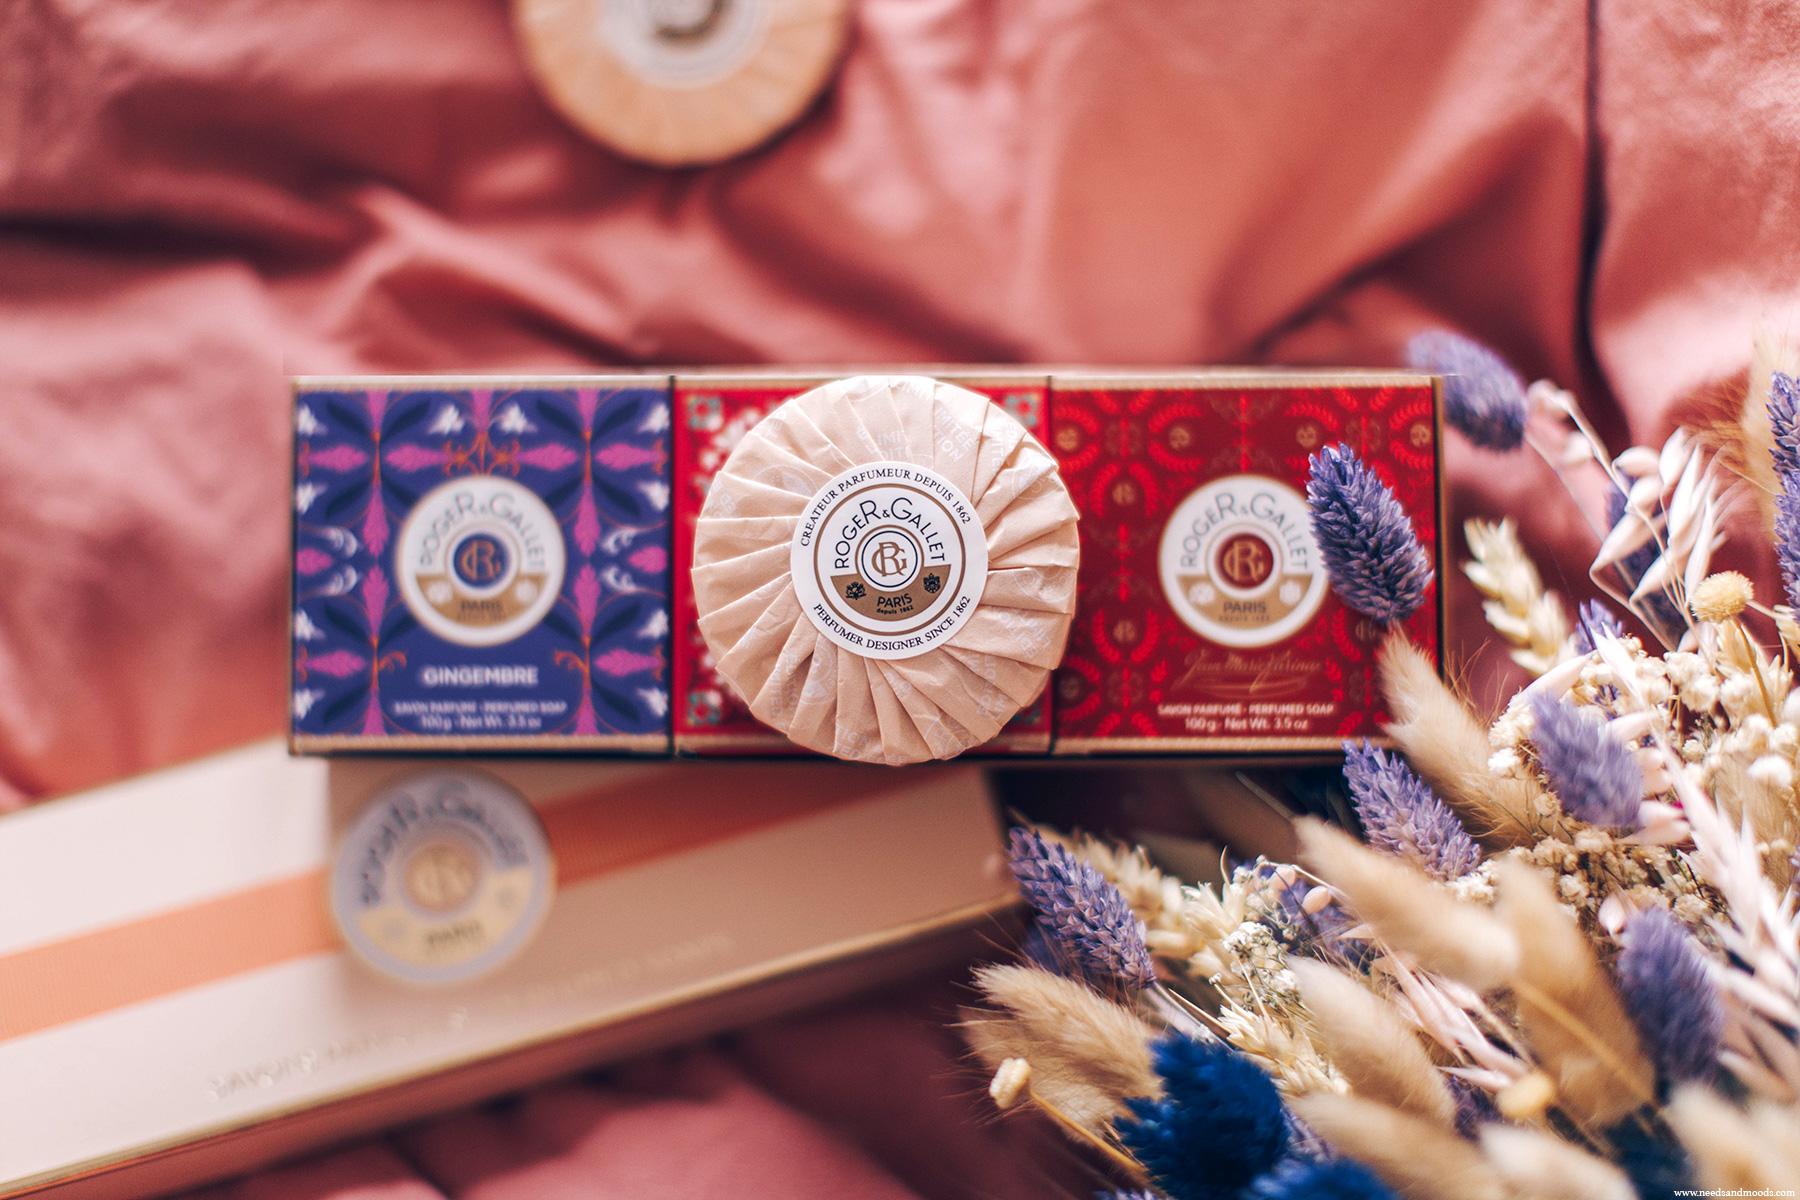 roger gallet savons parfumes vintage